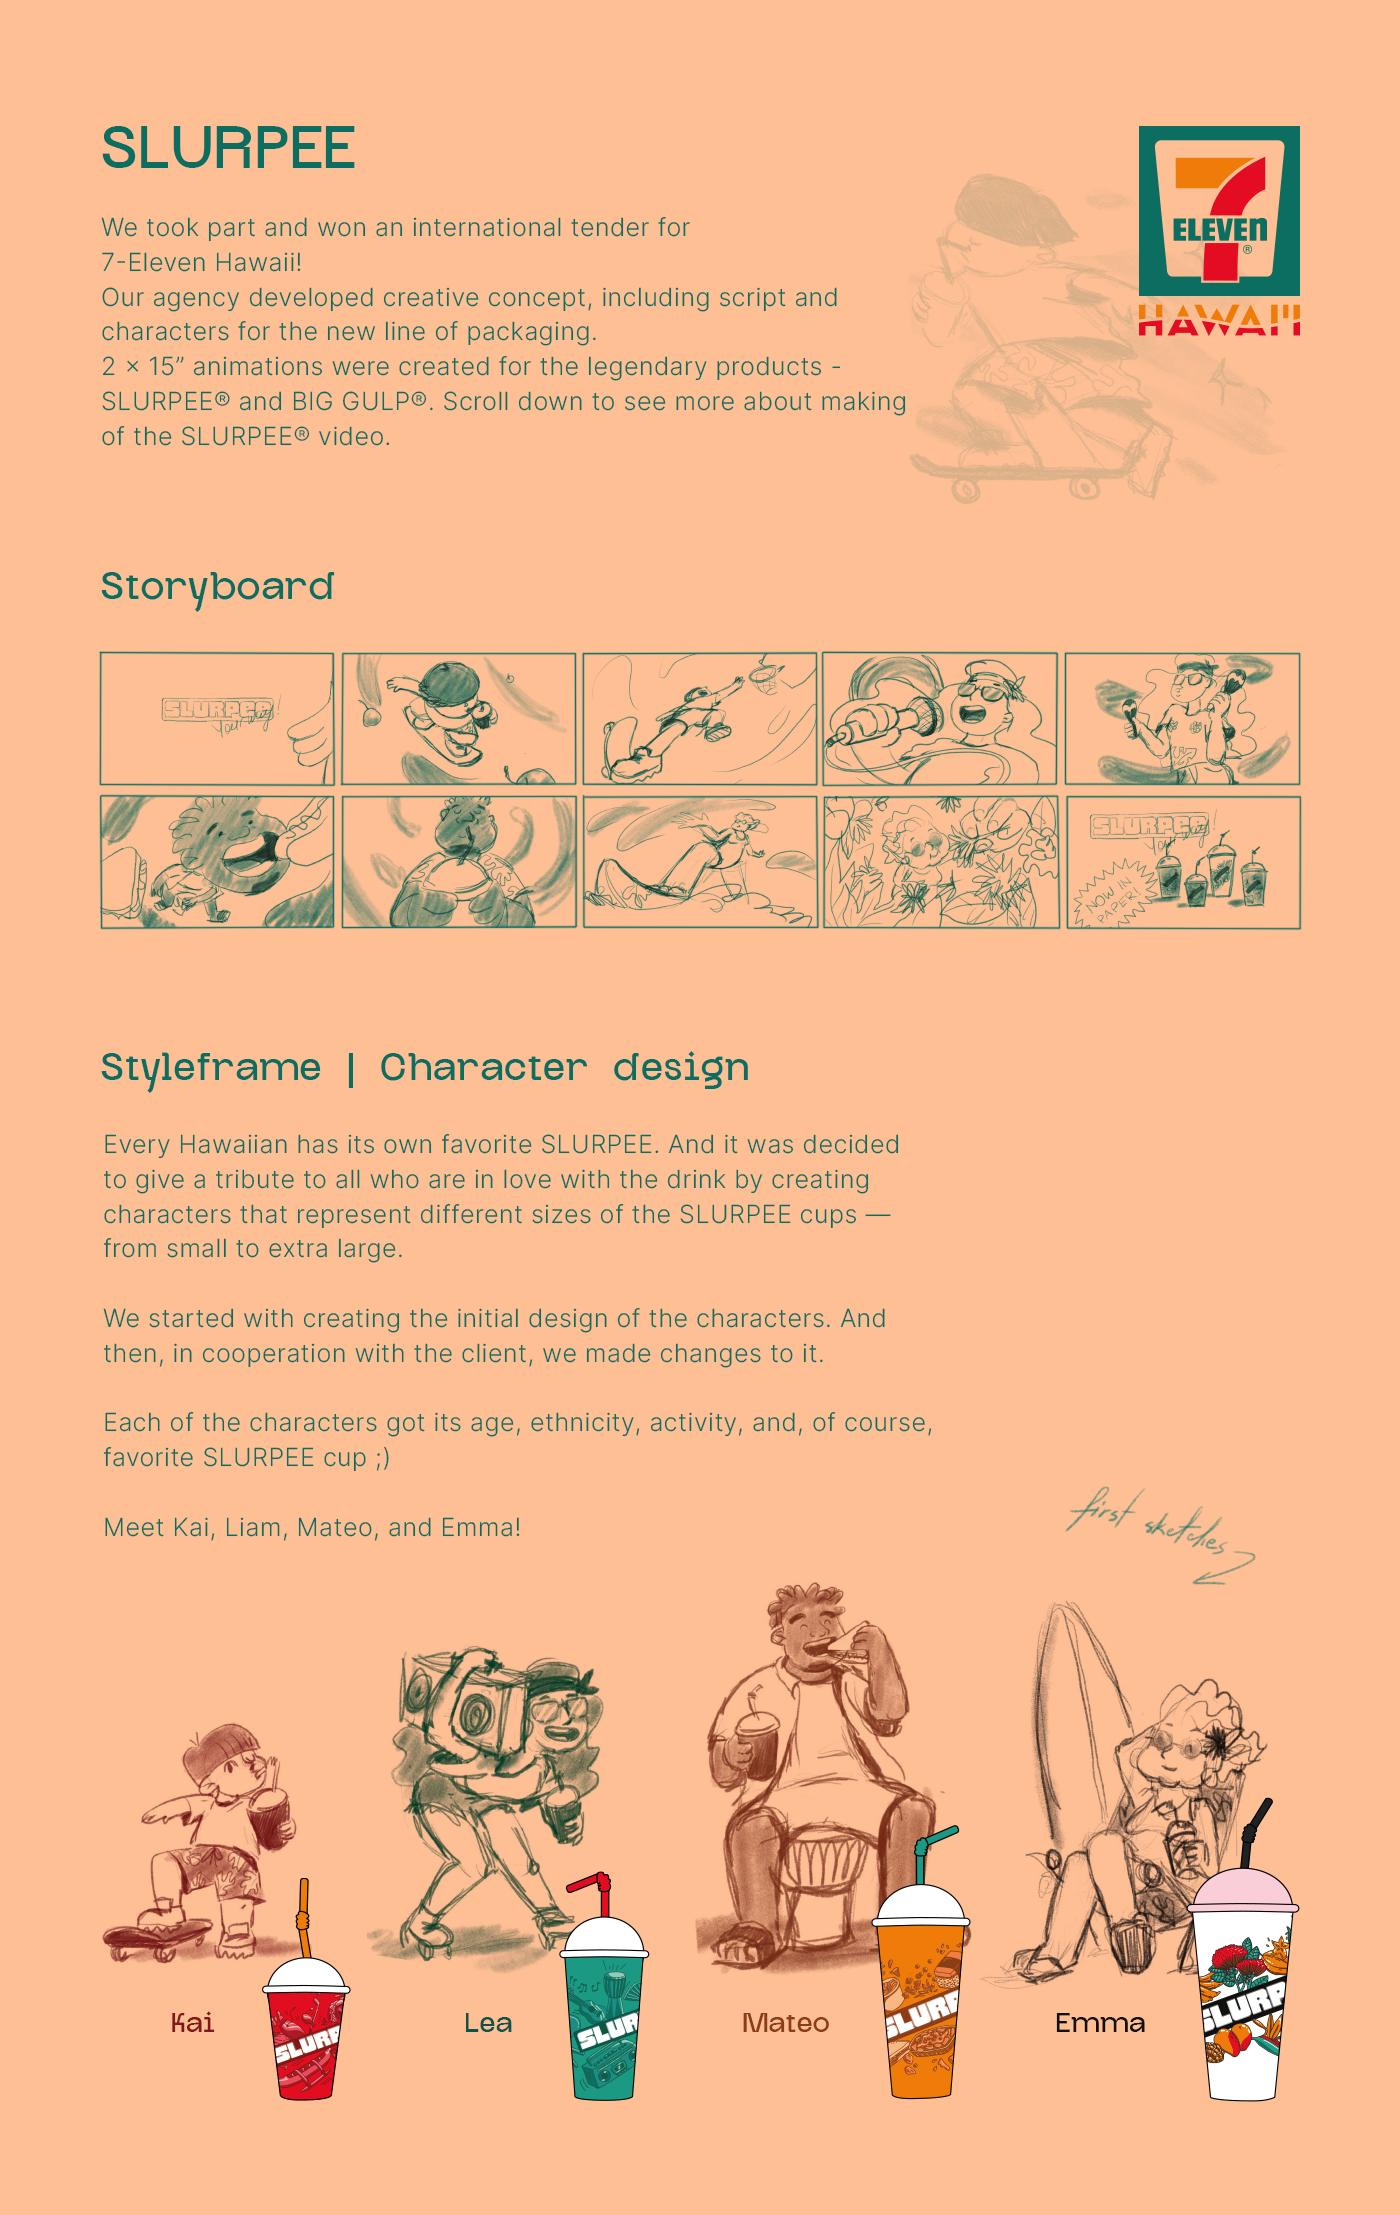 animation  cartoon Cel Animation Character design  frame by frame 2D Animation 7-Eleven promotional video SLURPEE explainer video